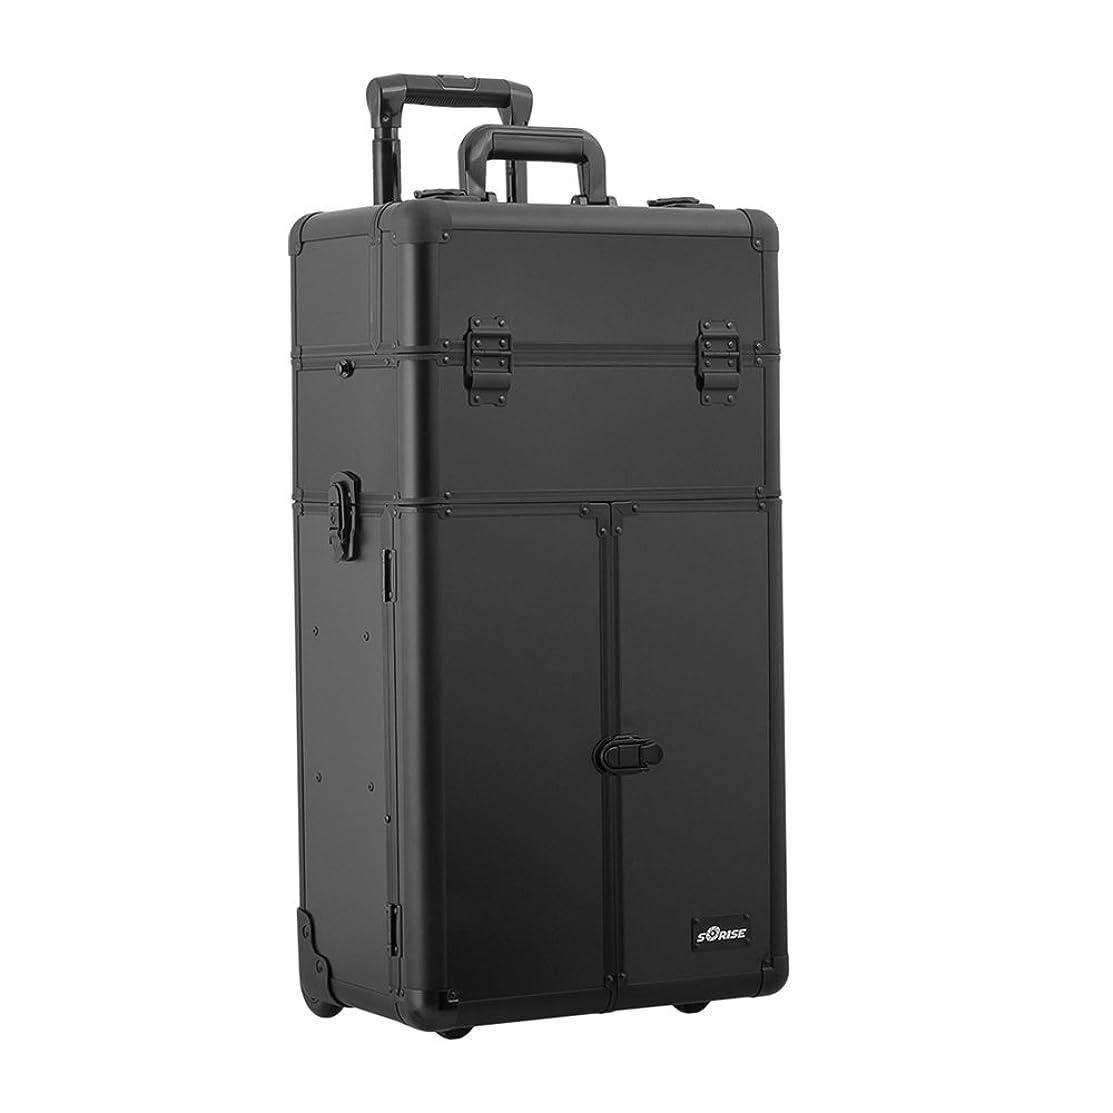 Black Smooth Trolley Craft/Quilting Storage Case - I3566